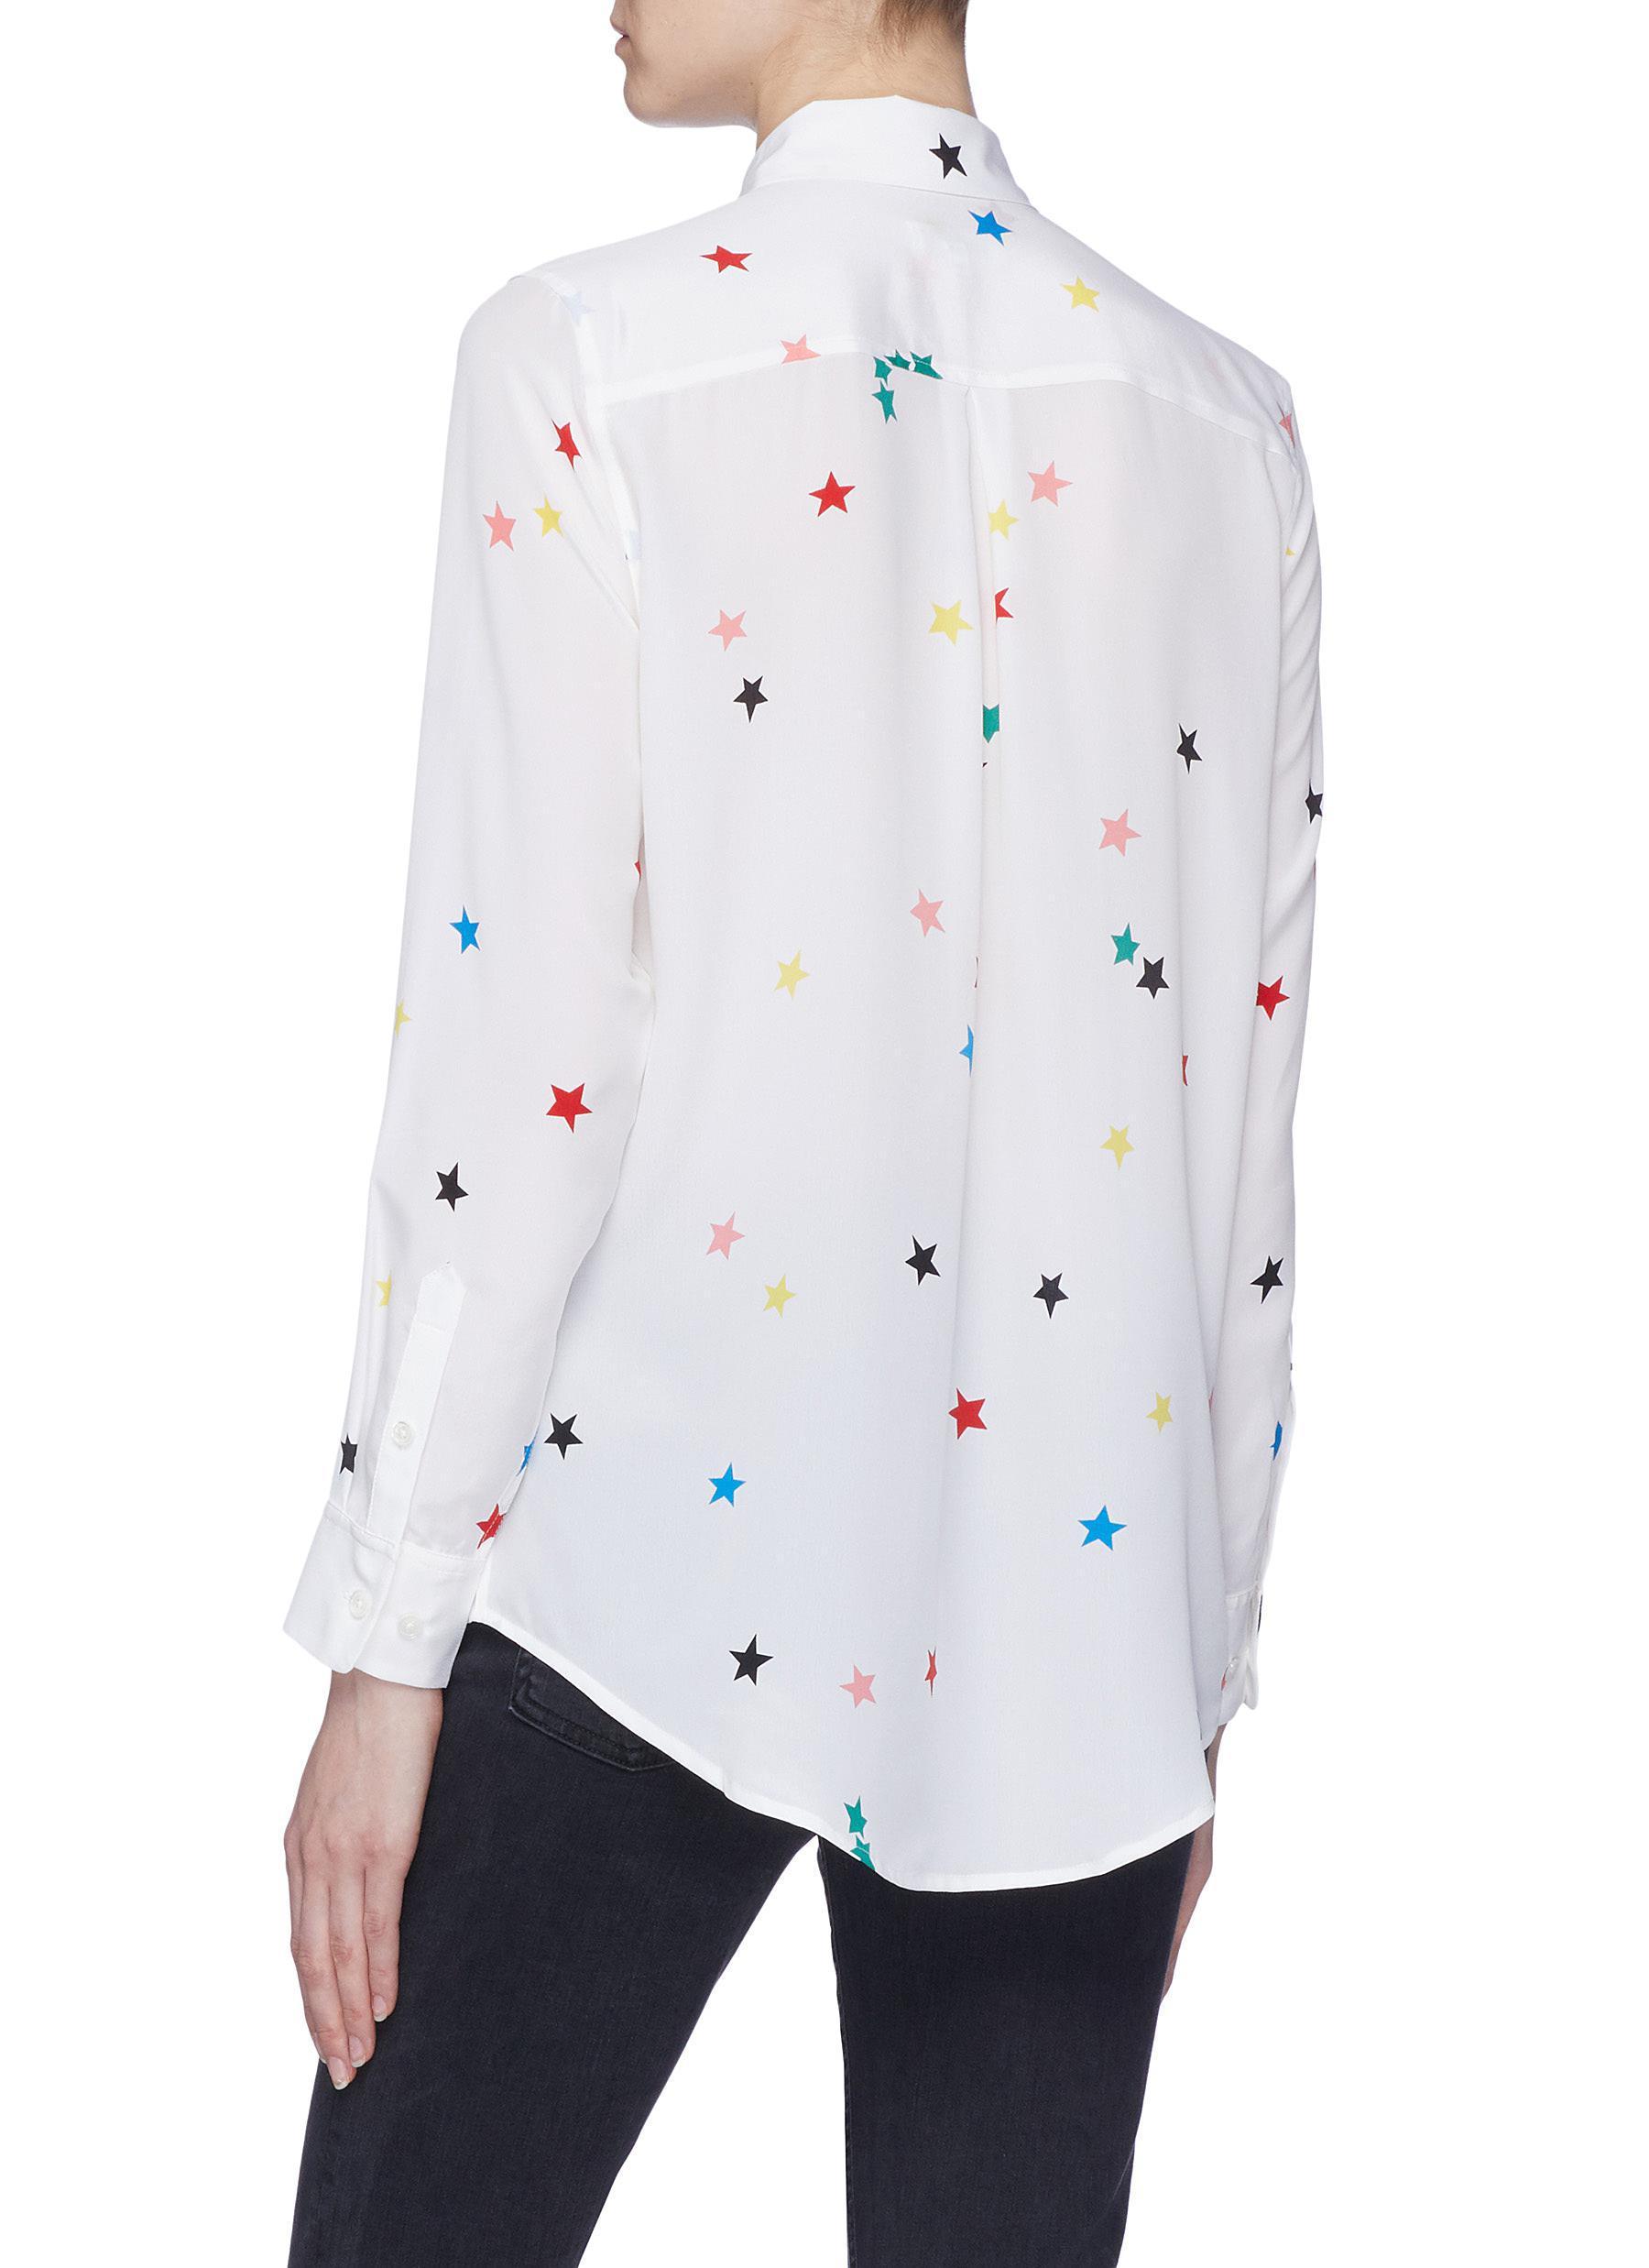 b2f61eed787522 Lyst - Equipment  essential  Star Print Silk Crepe Shirt in White